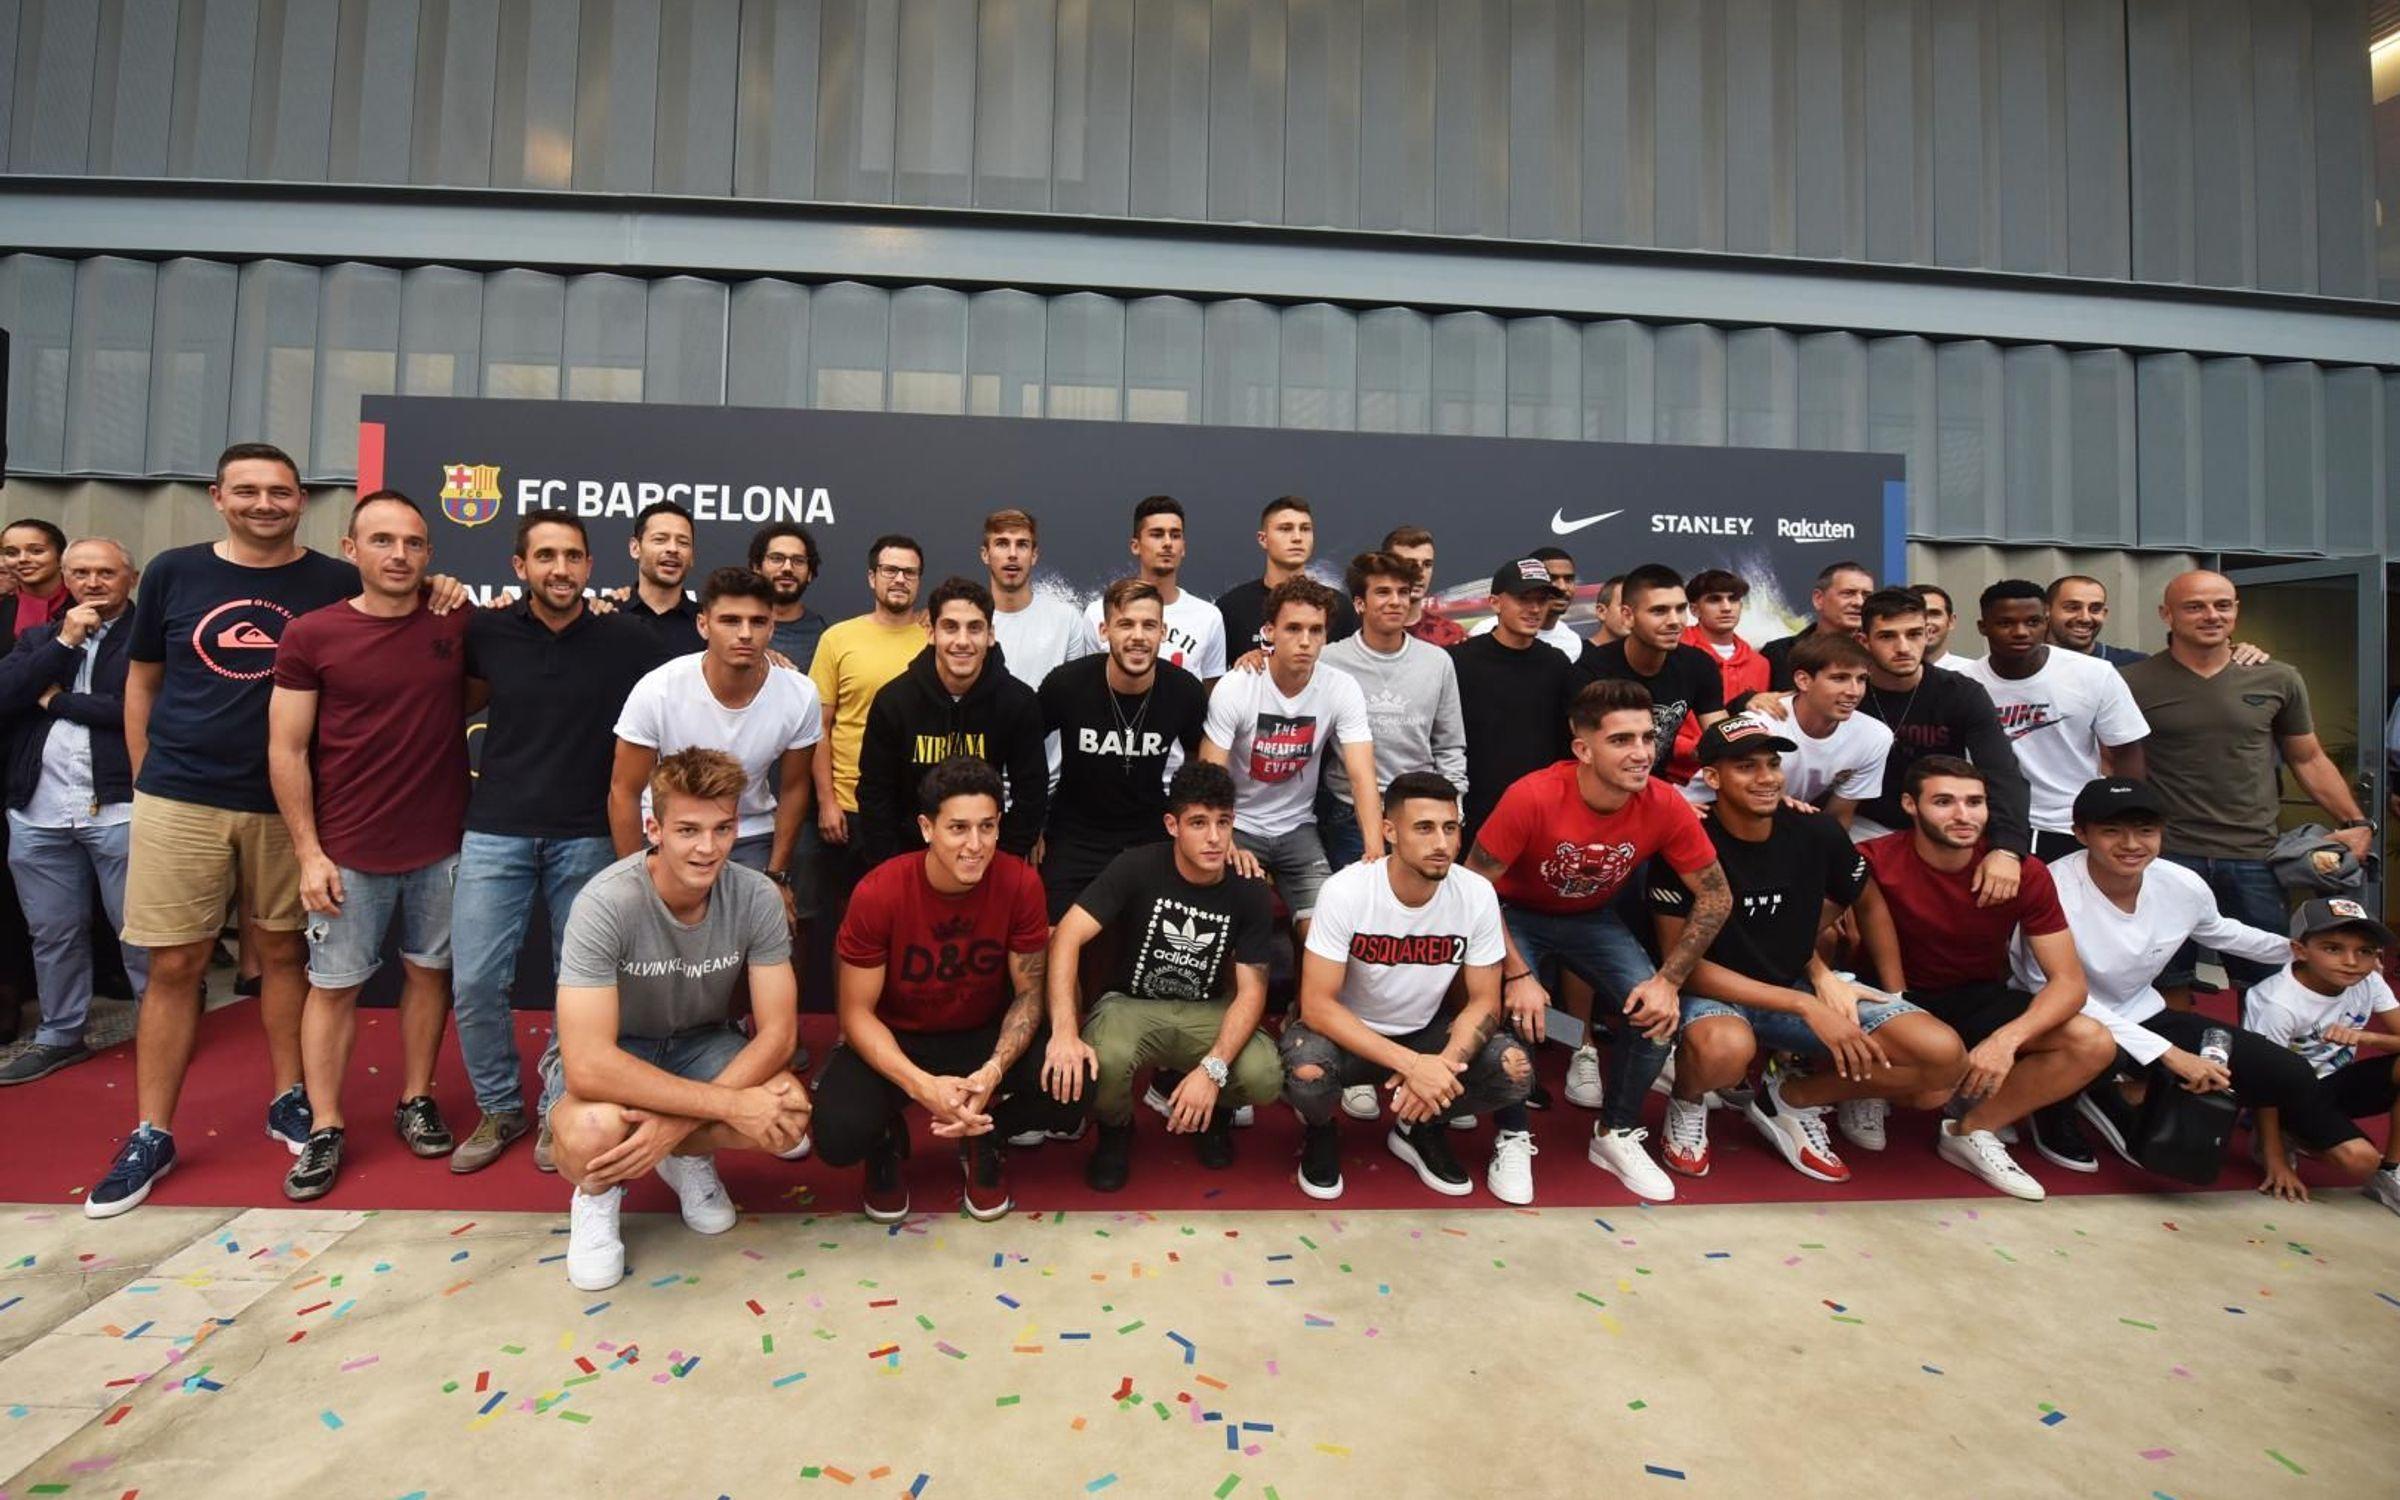 opening of Johan Cruyff stadium